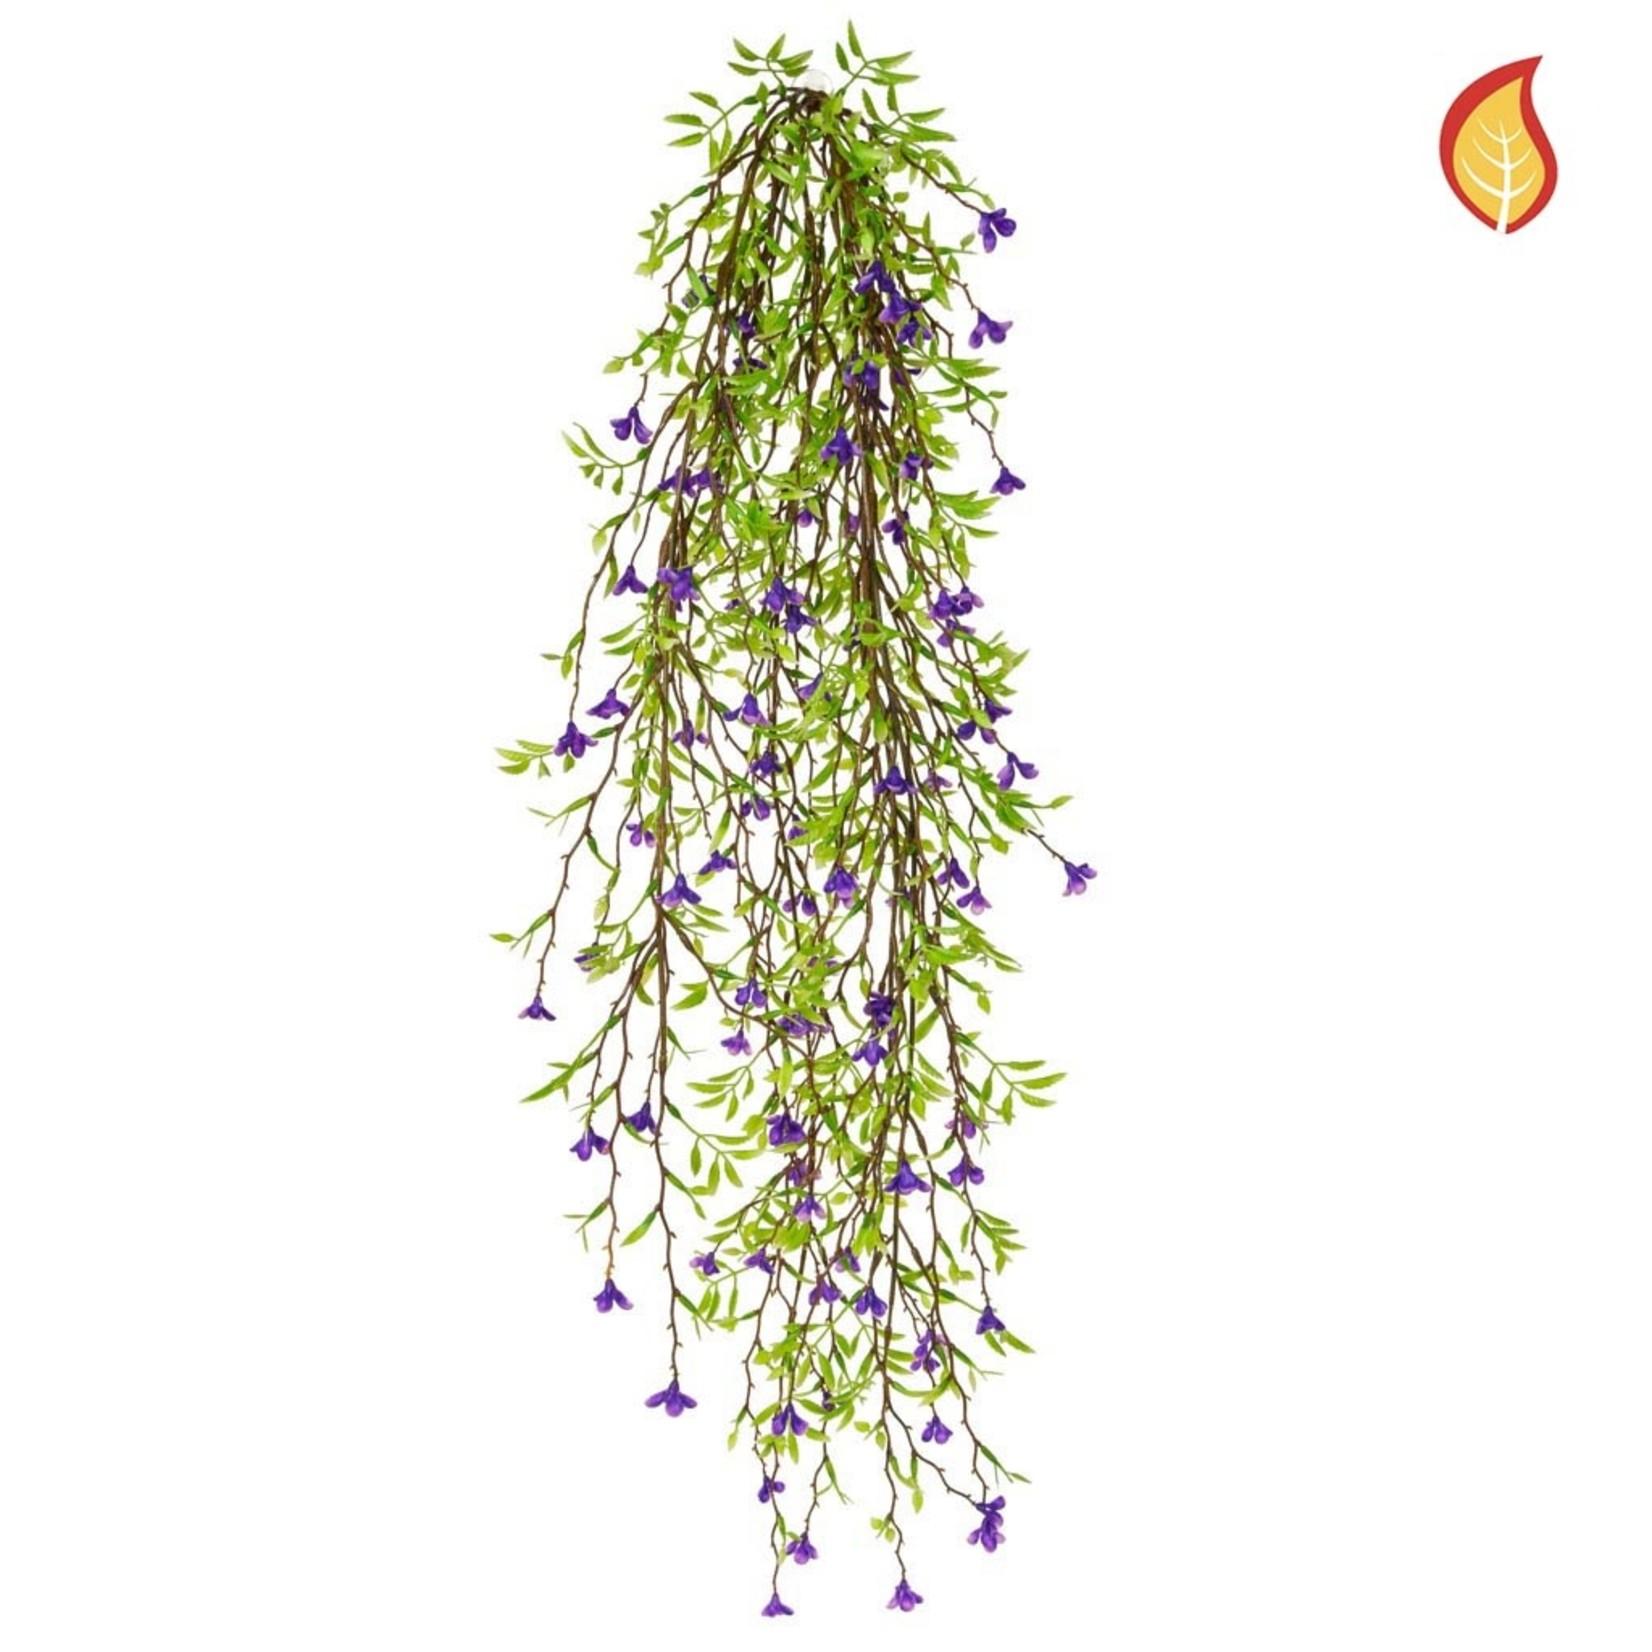 I & T Base Green Leaf Purple Flower 64cm - Fire Rated